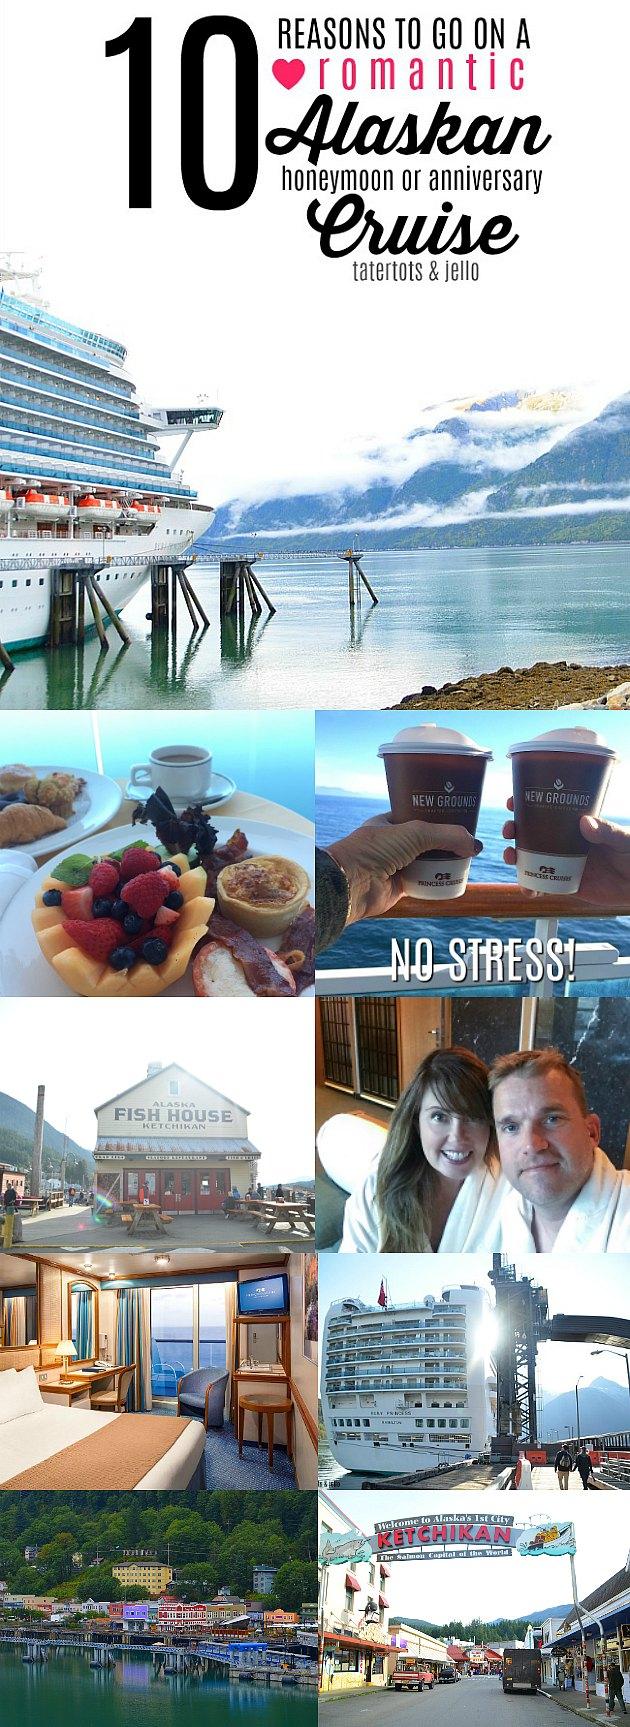 10 reasons to go on an alaskan honeymoon cruise!